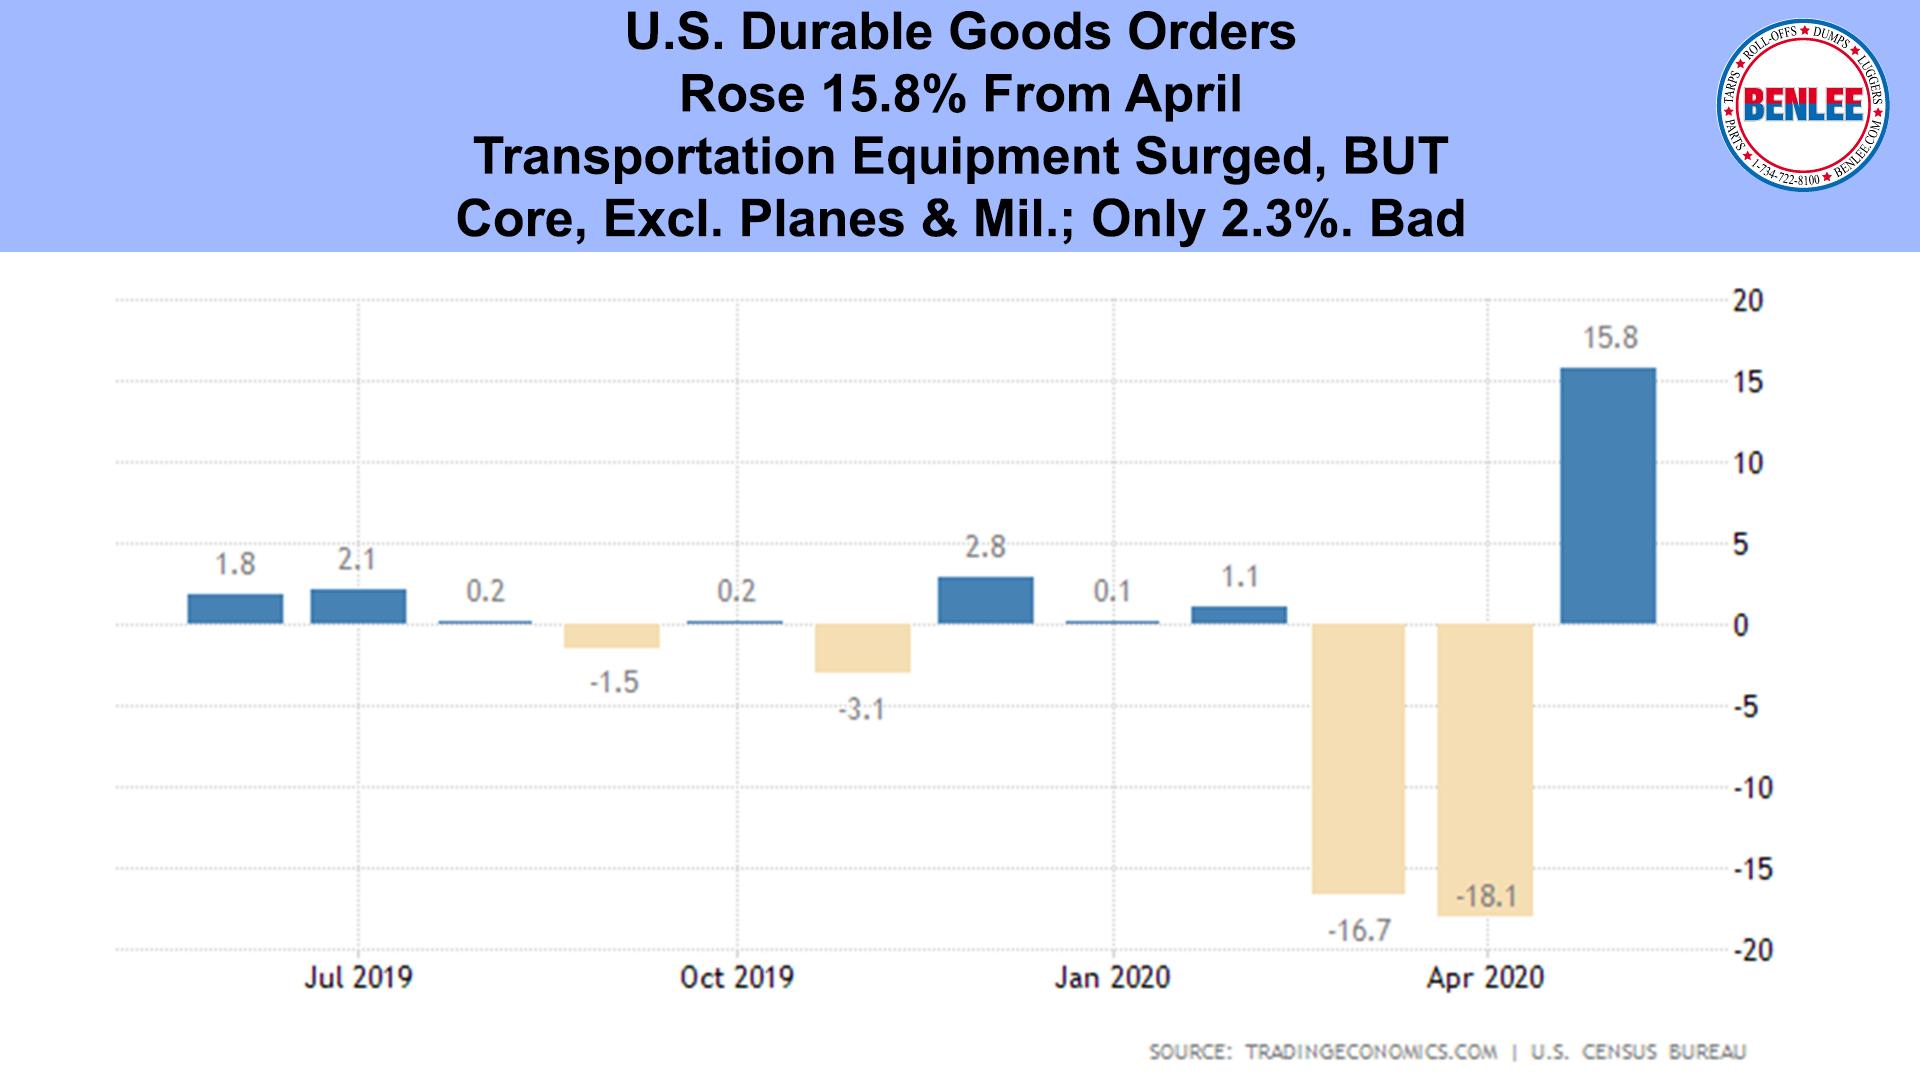 U.S. Durable Goods Orders